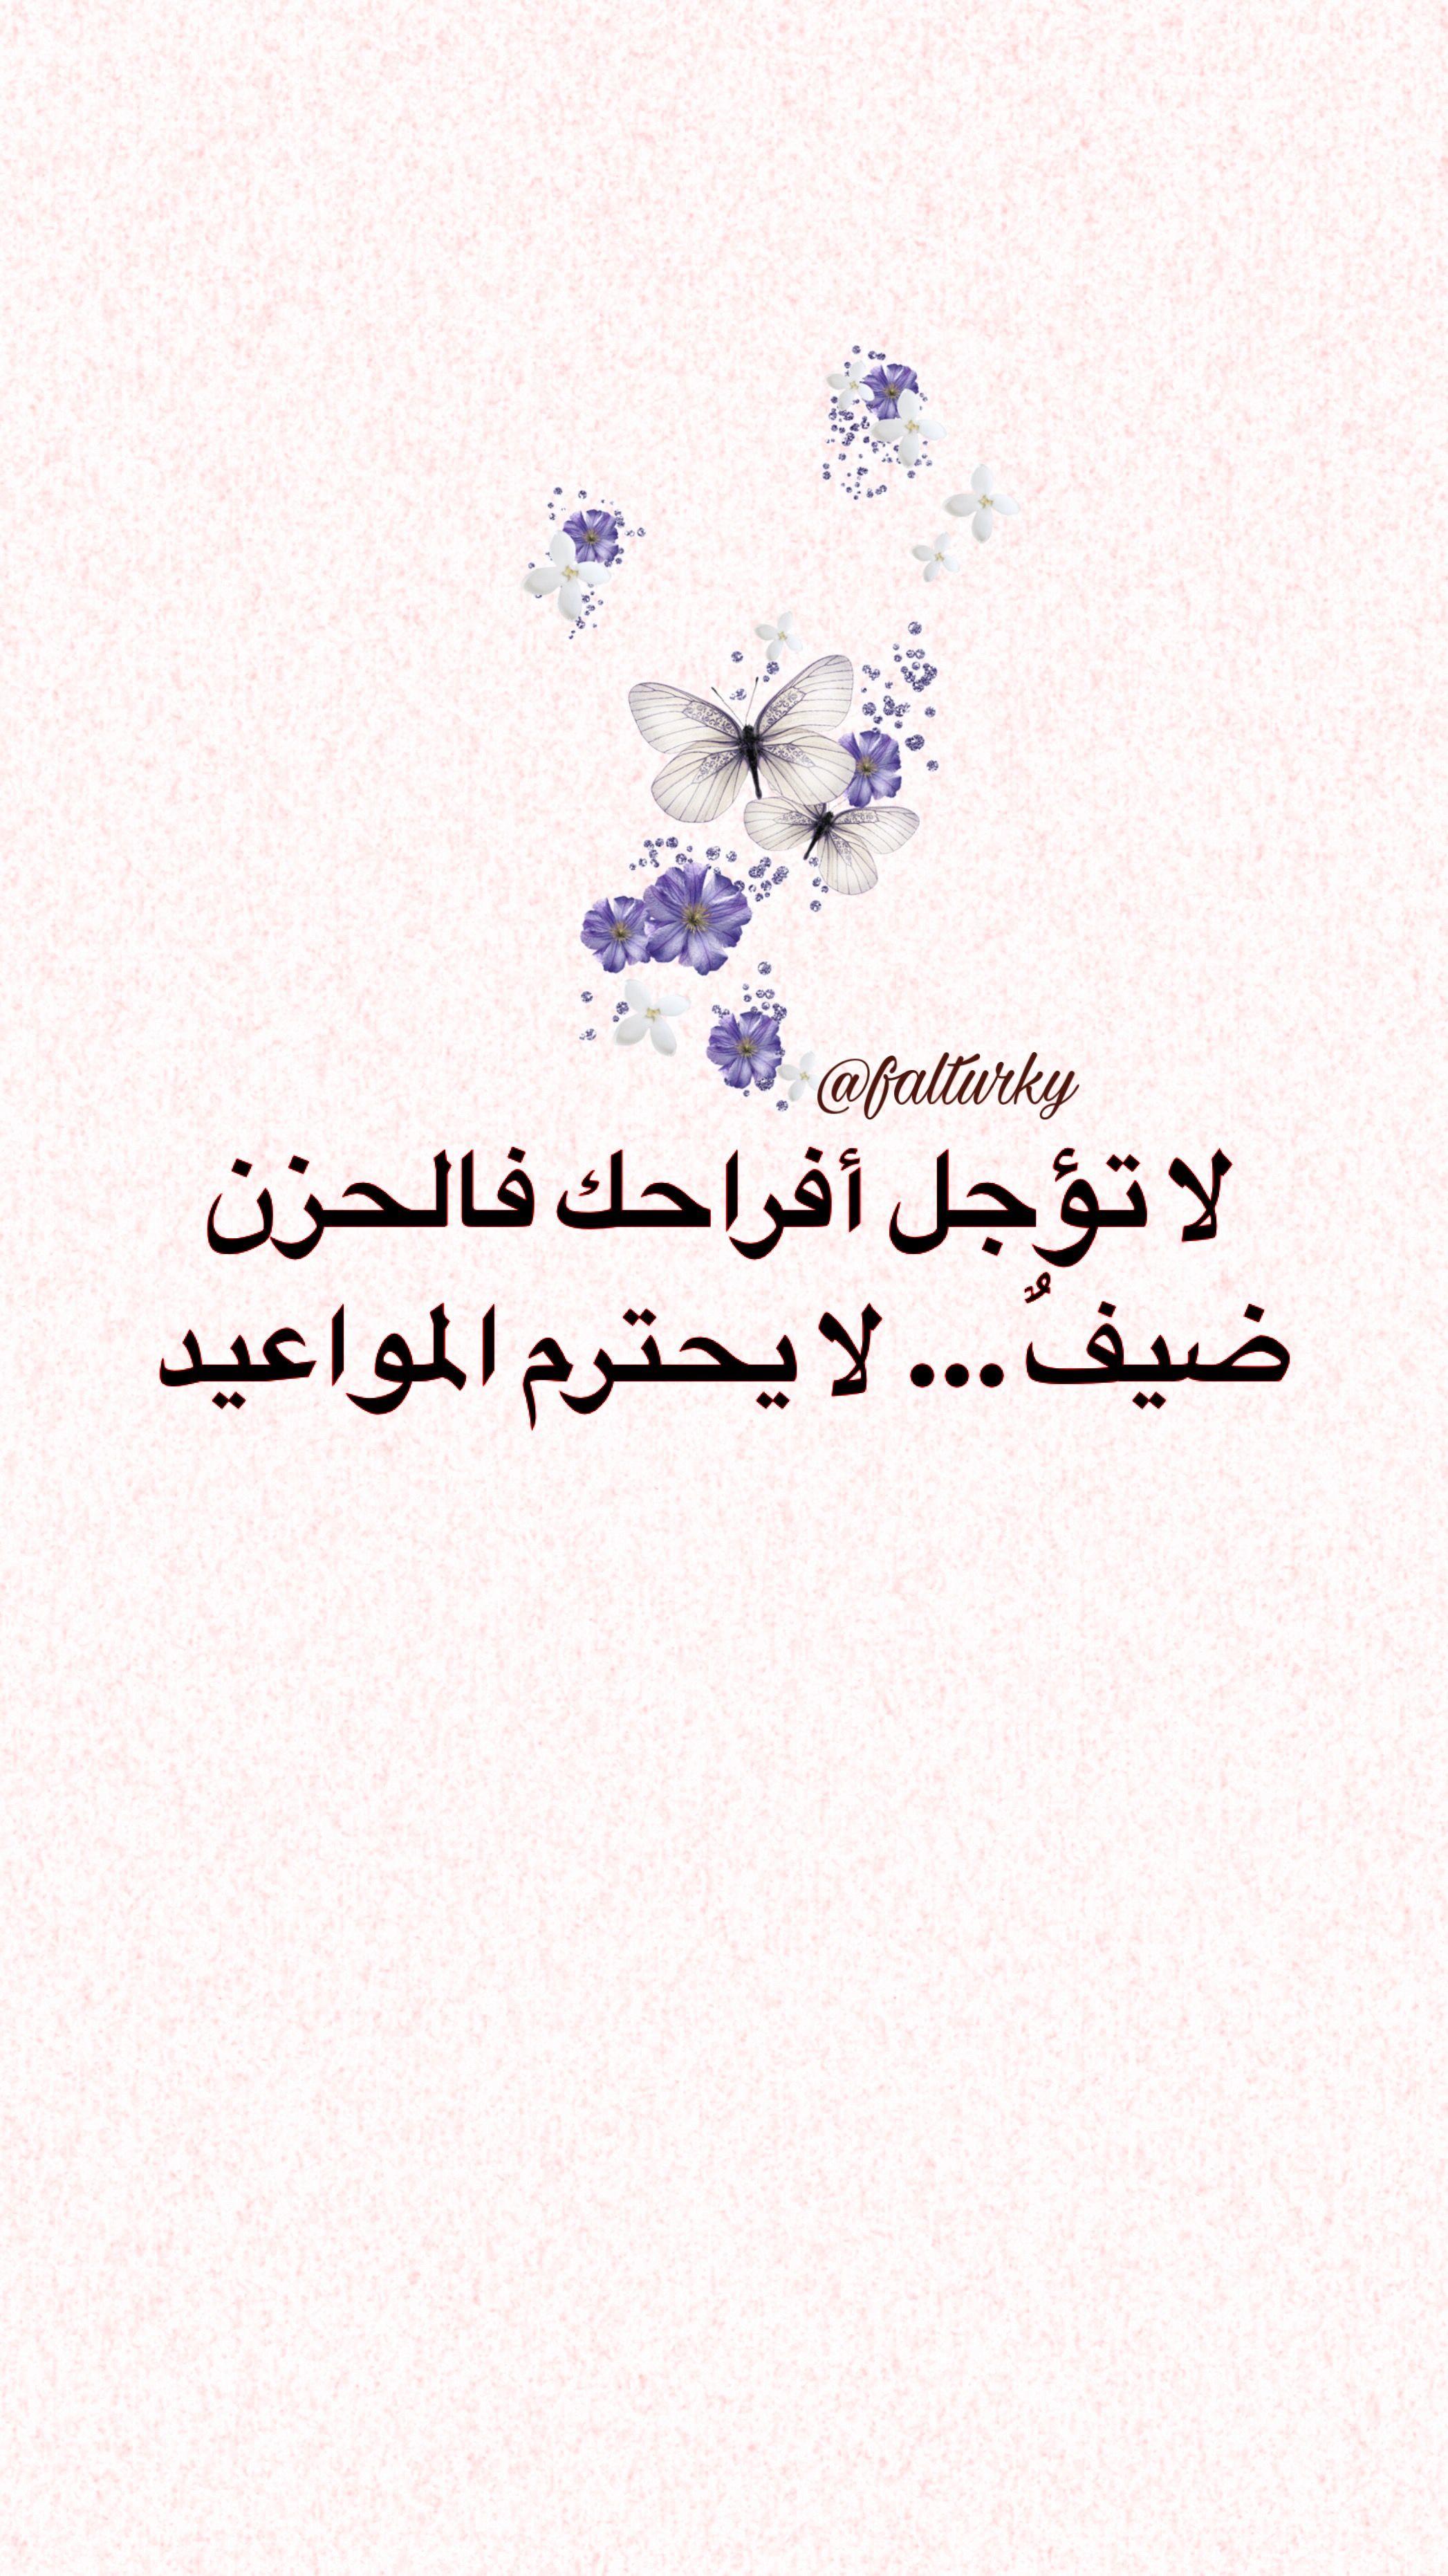 Pin By Foooz On ايجابيات Calligraphy Arabic Calligraphy Arabic